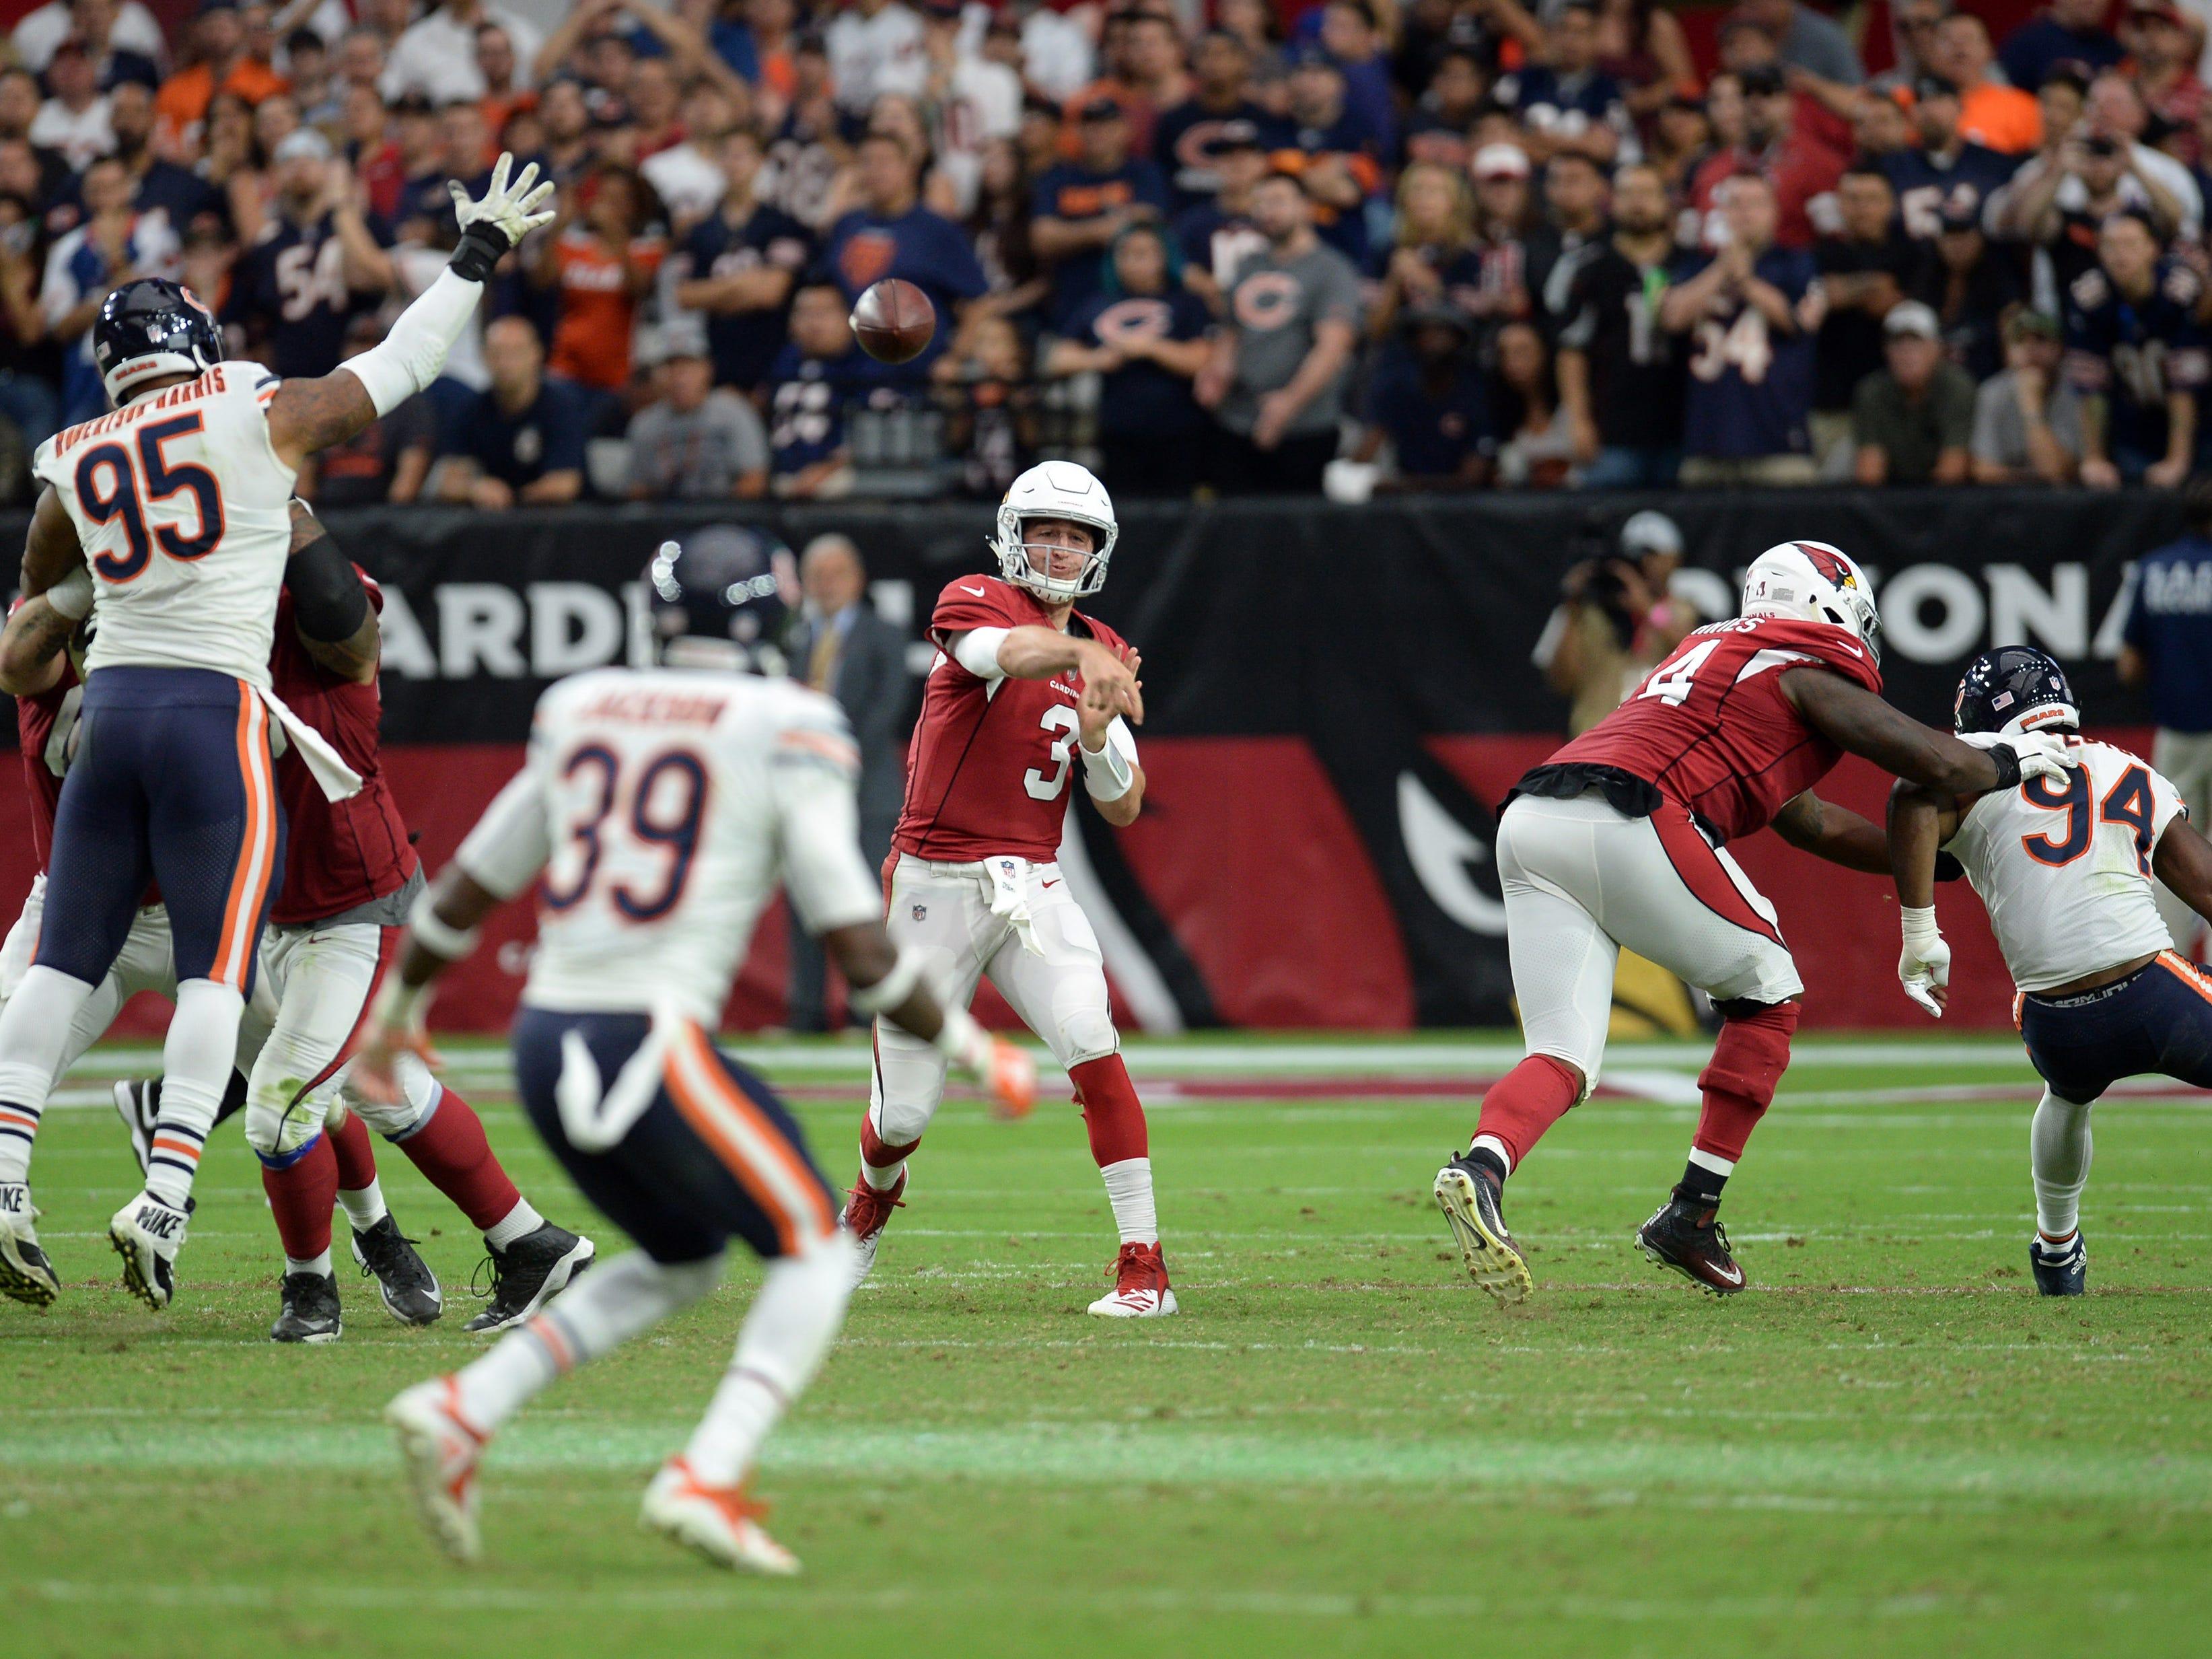 Sep 23, 2018; Glendale, AZ, USA; Arizona Cardinals quarterback Josh Rosen (3) throws a pass against the Chicago Bears during the second half at State Farm Stadium. Mandatory Credit: Joe Camporeale-USA TODAY Sports